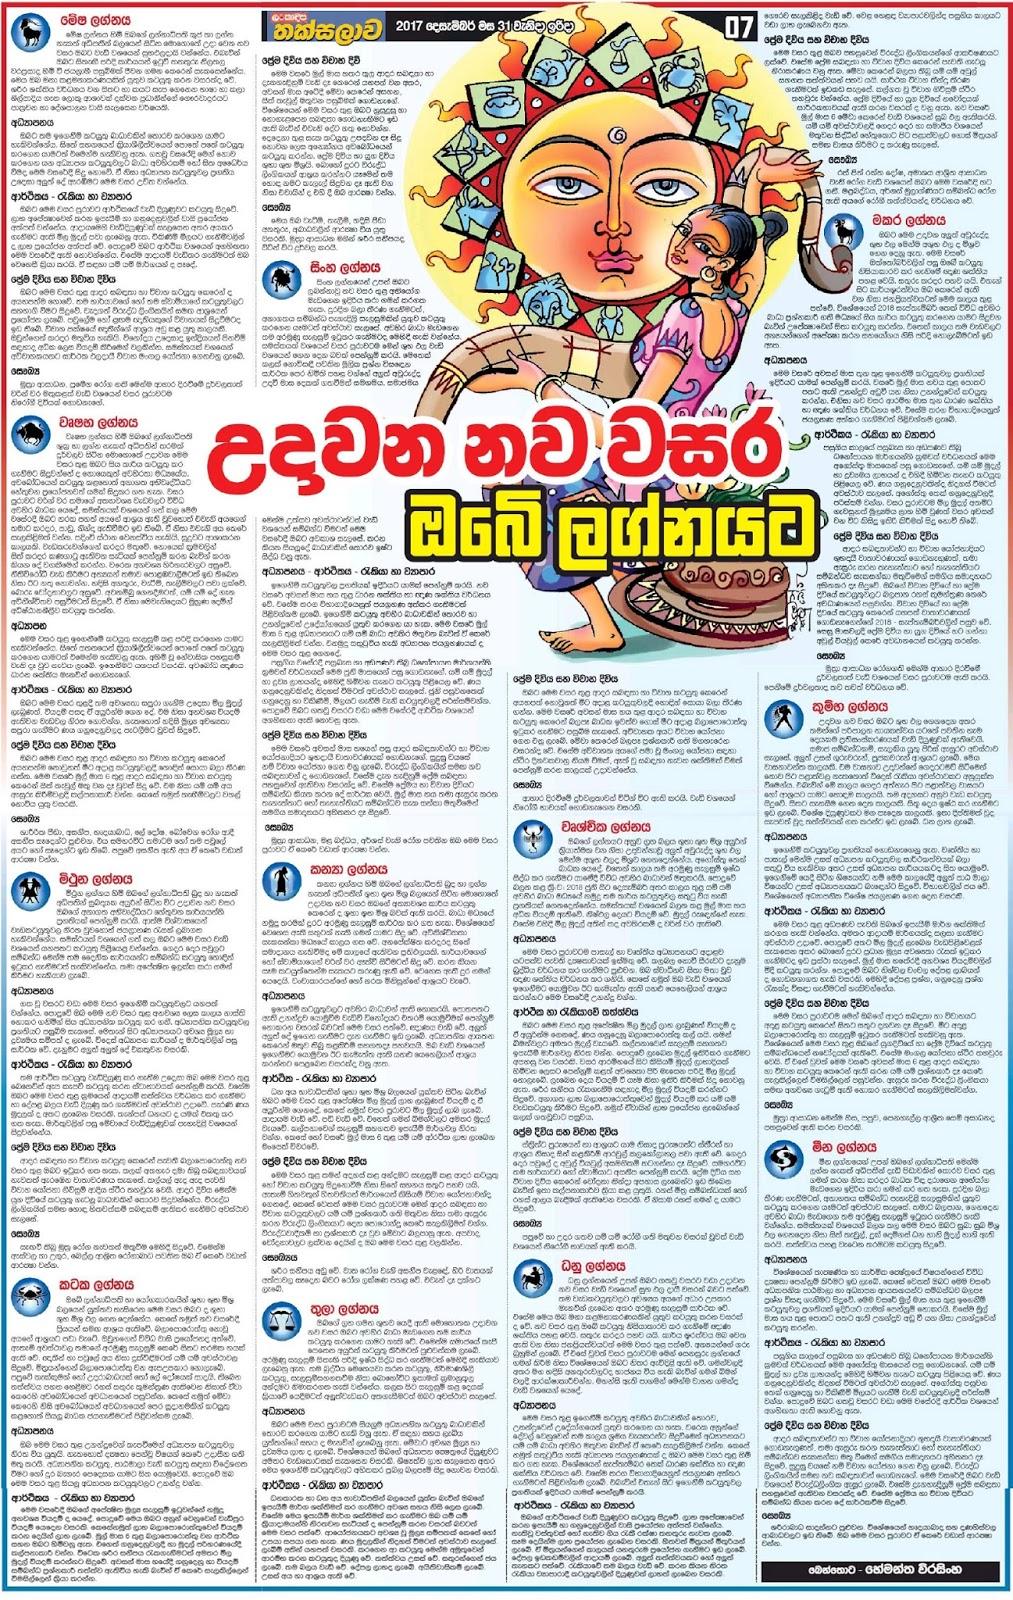 2018 Litha Sinhala >> 2018 නව වසර ඔබට කොහොමද ? | Sri Lanka Newspaper Articles